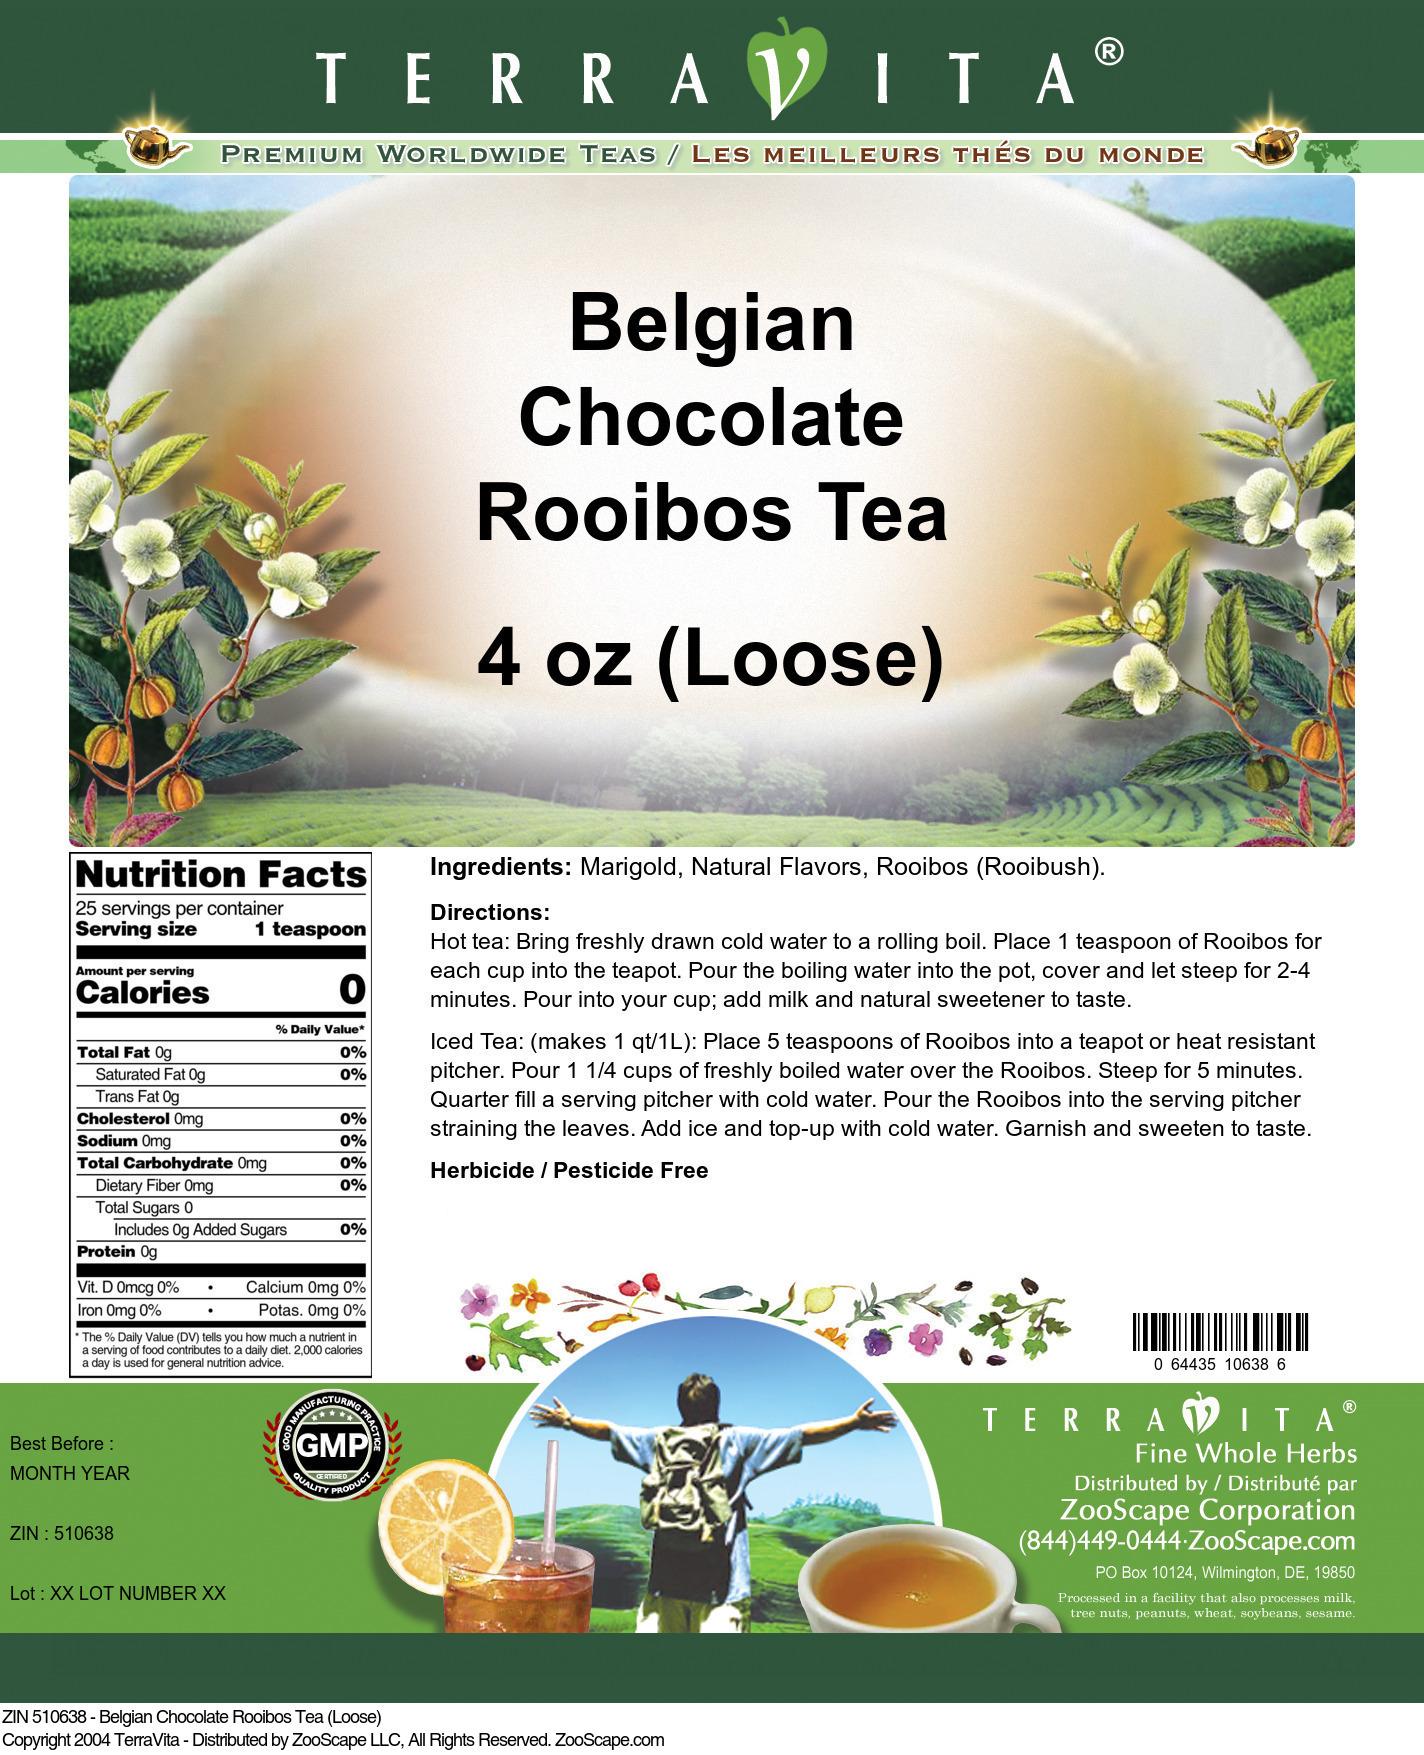 Belgian Chocolate Rooibos Tea